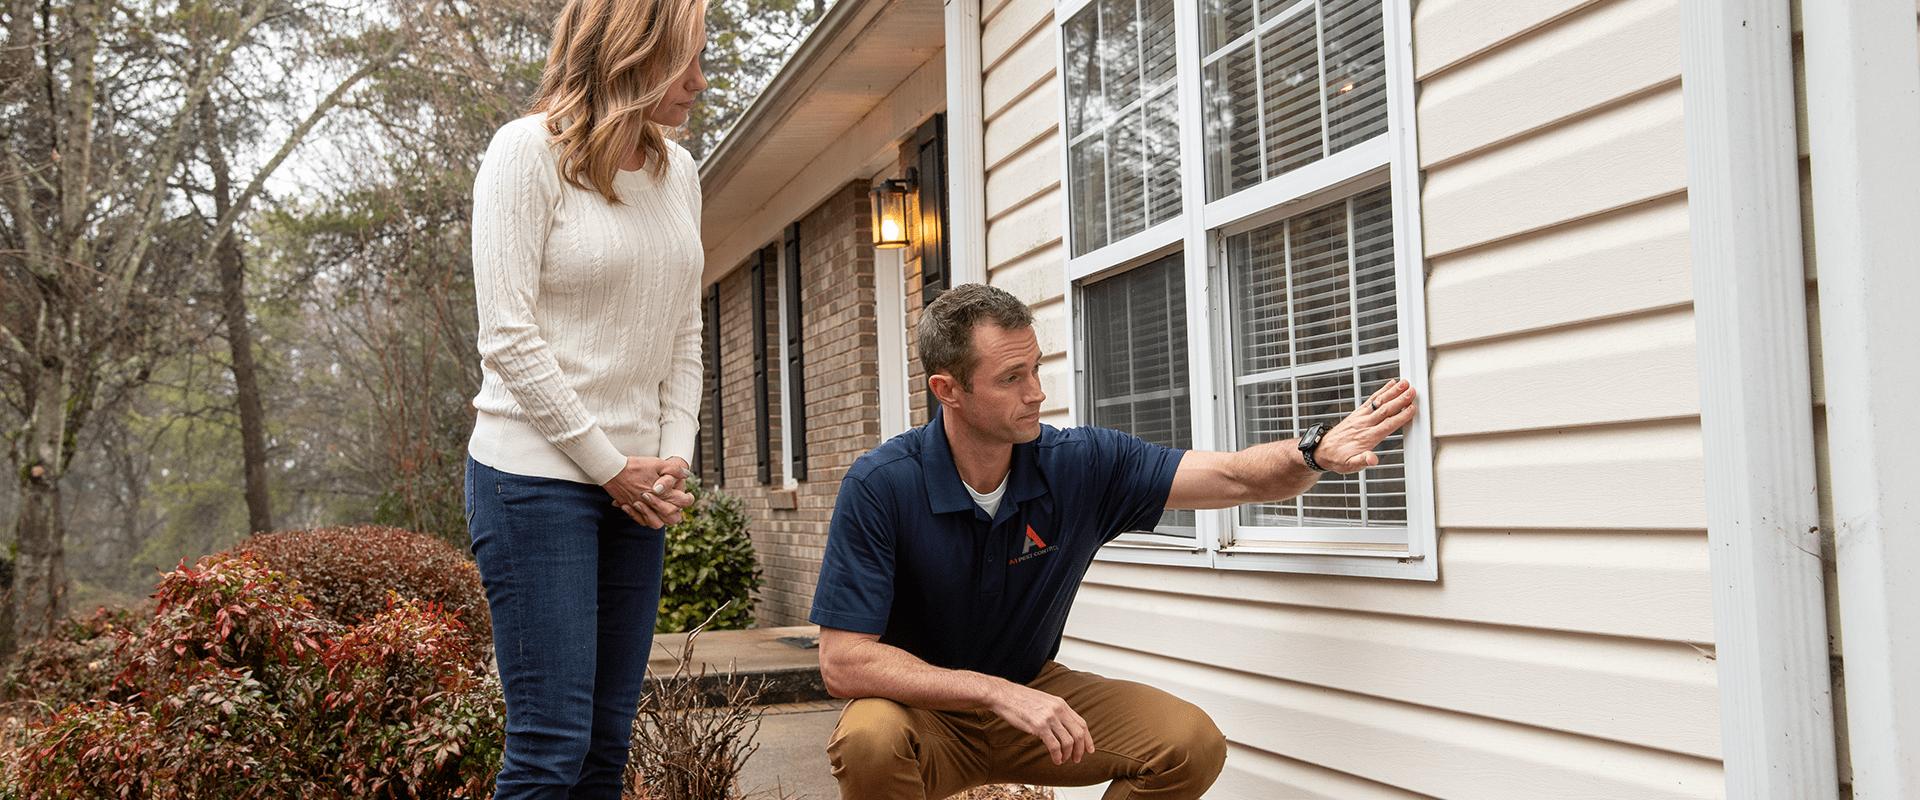 termite control technician with homeowner